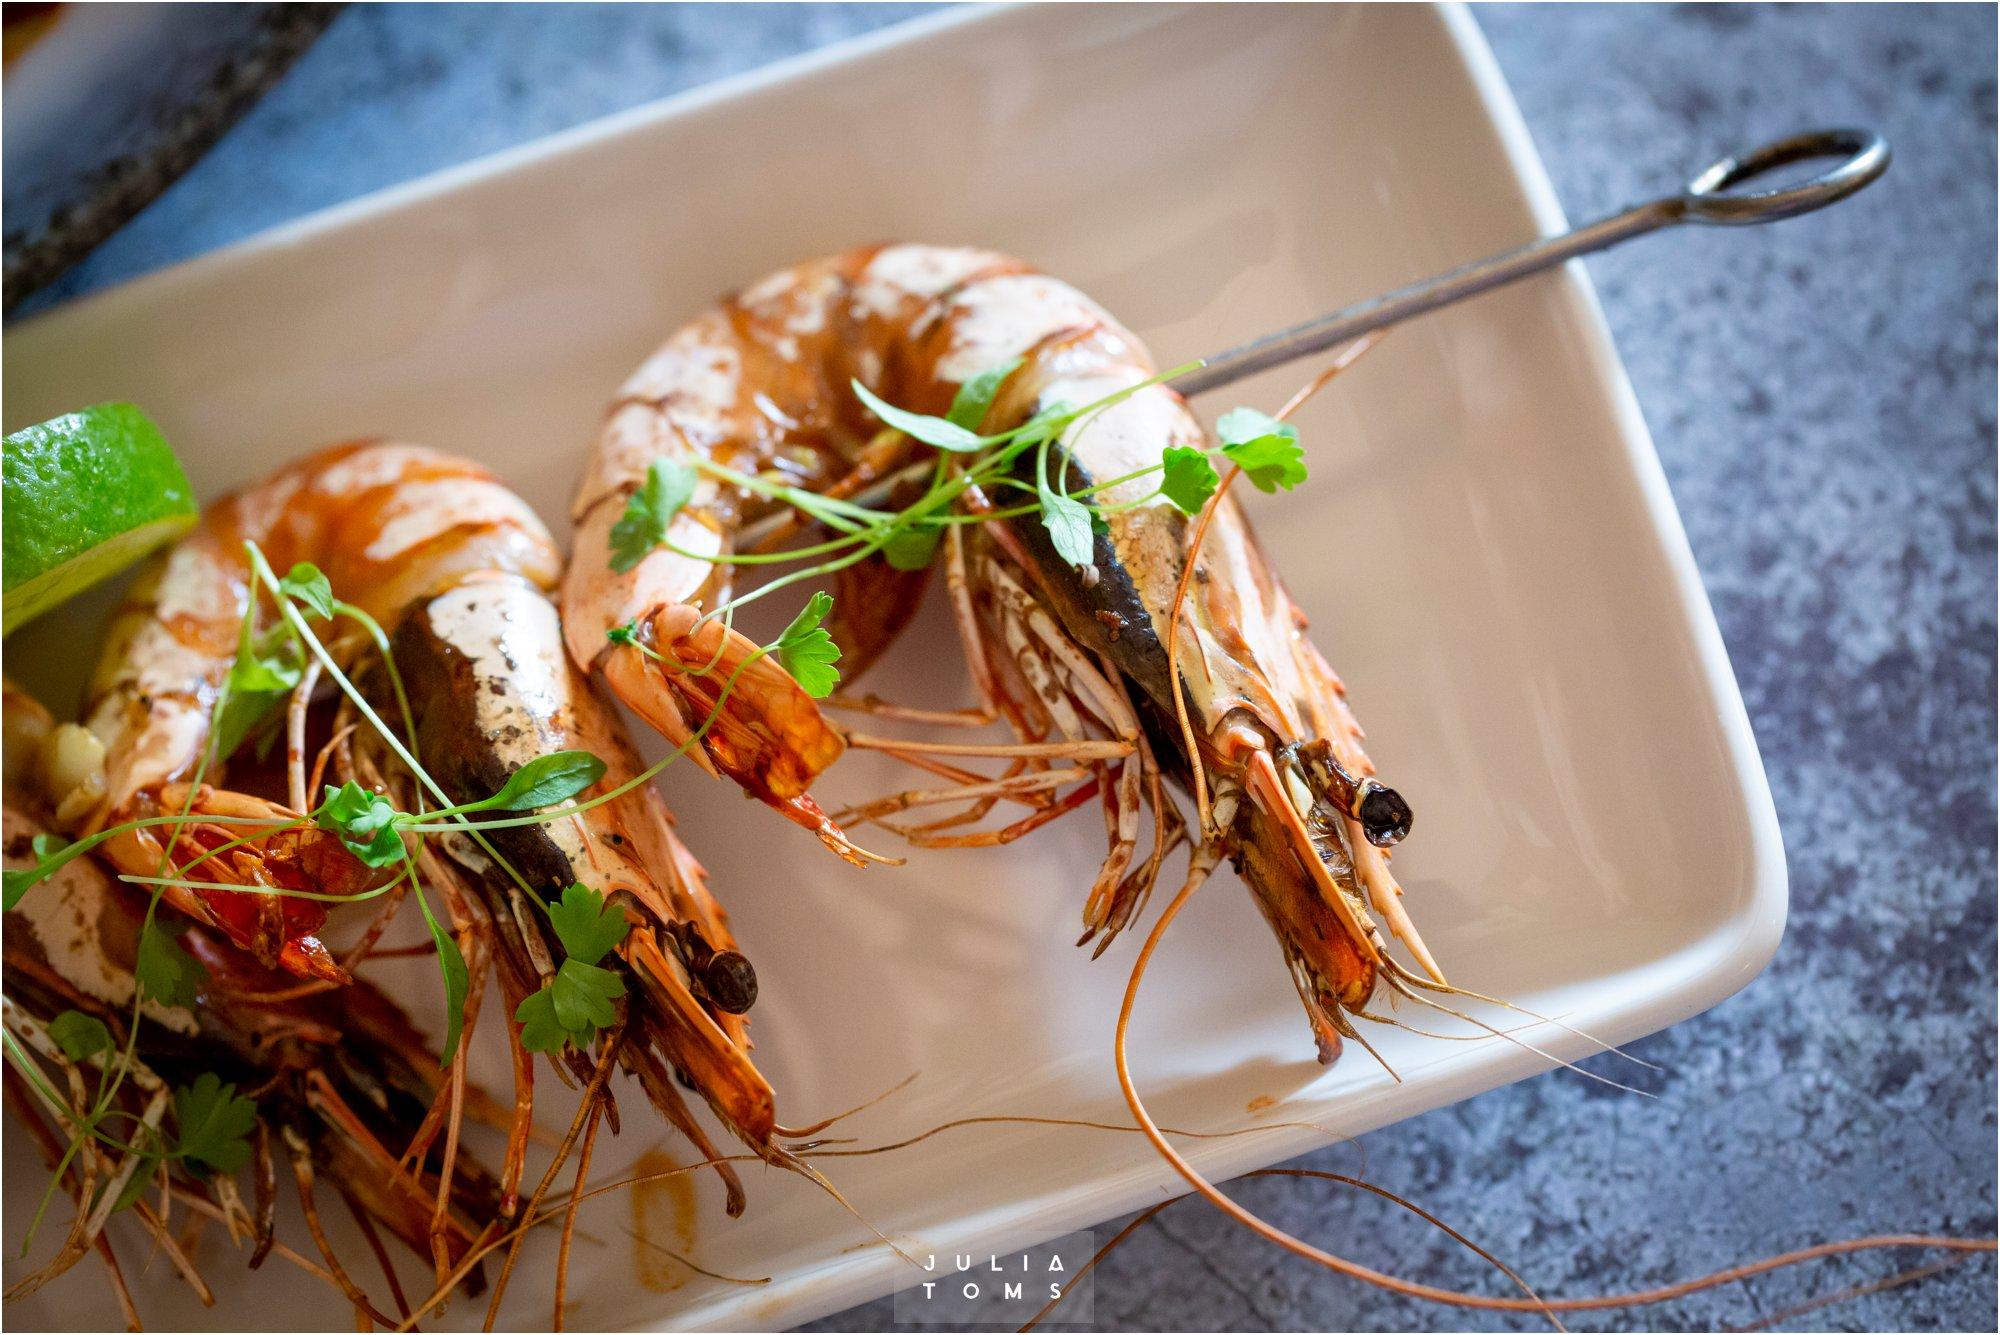 juliatoms_food_photography_chichester_001.jpg